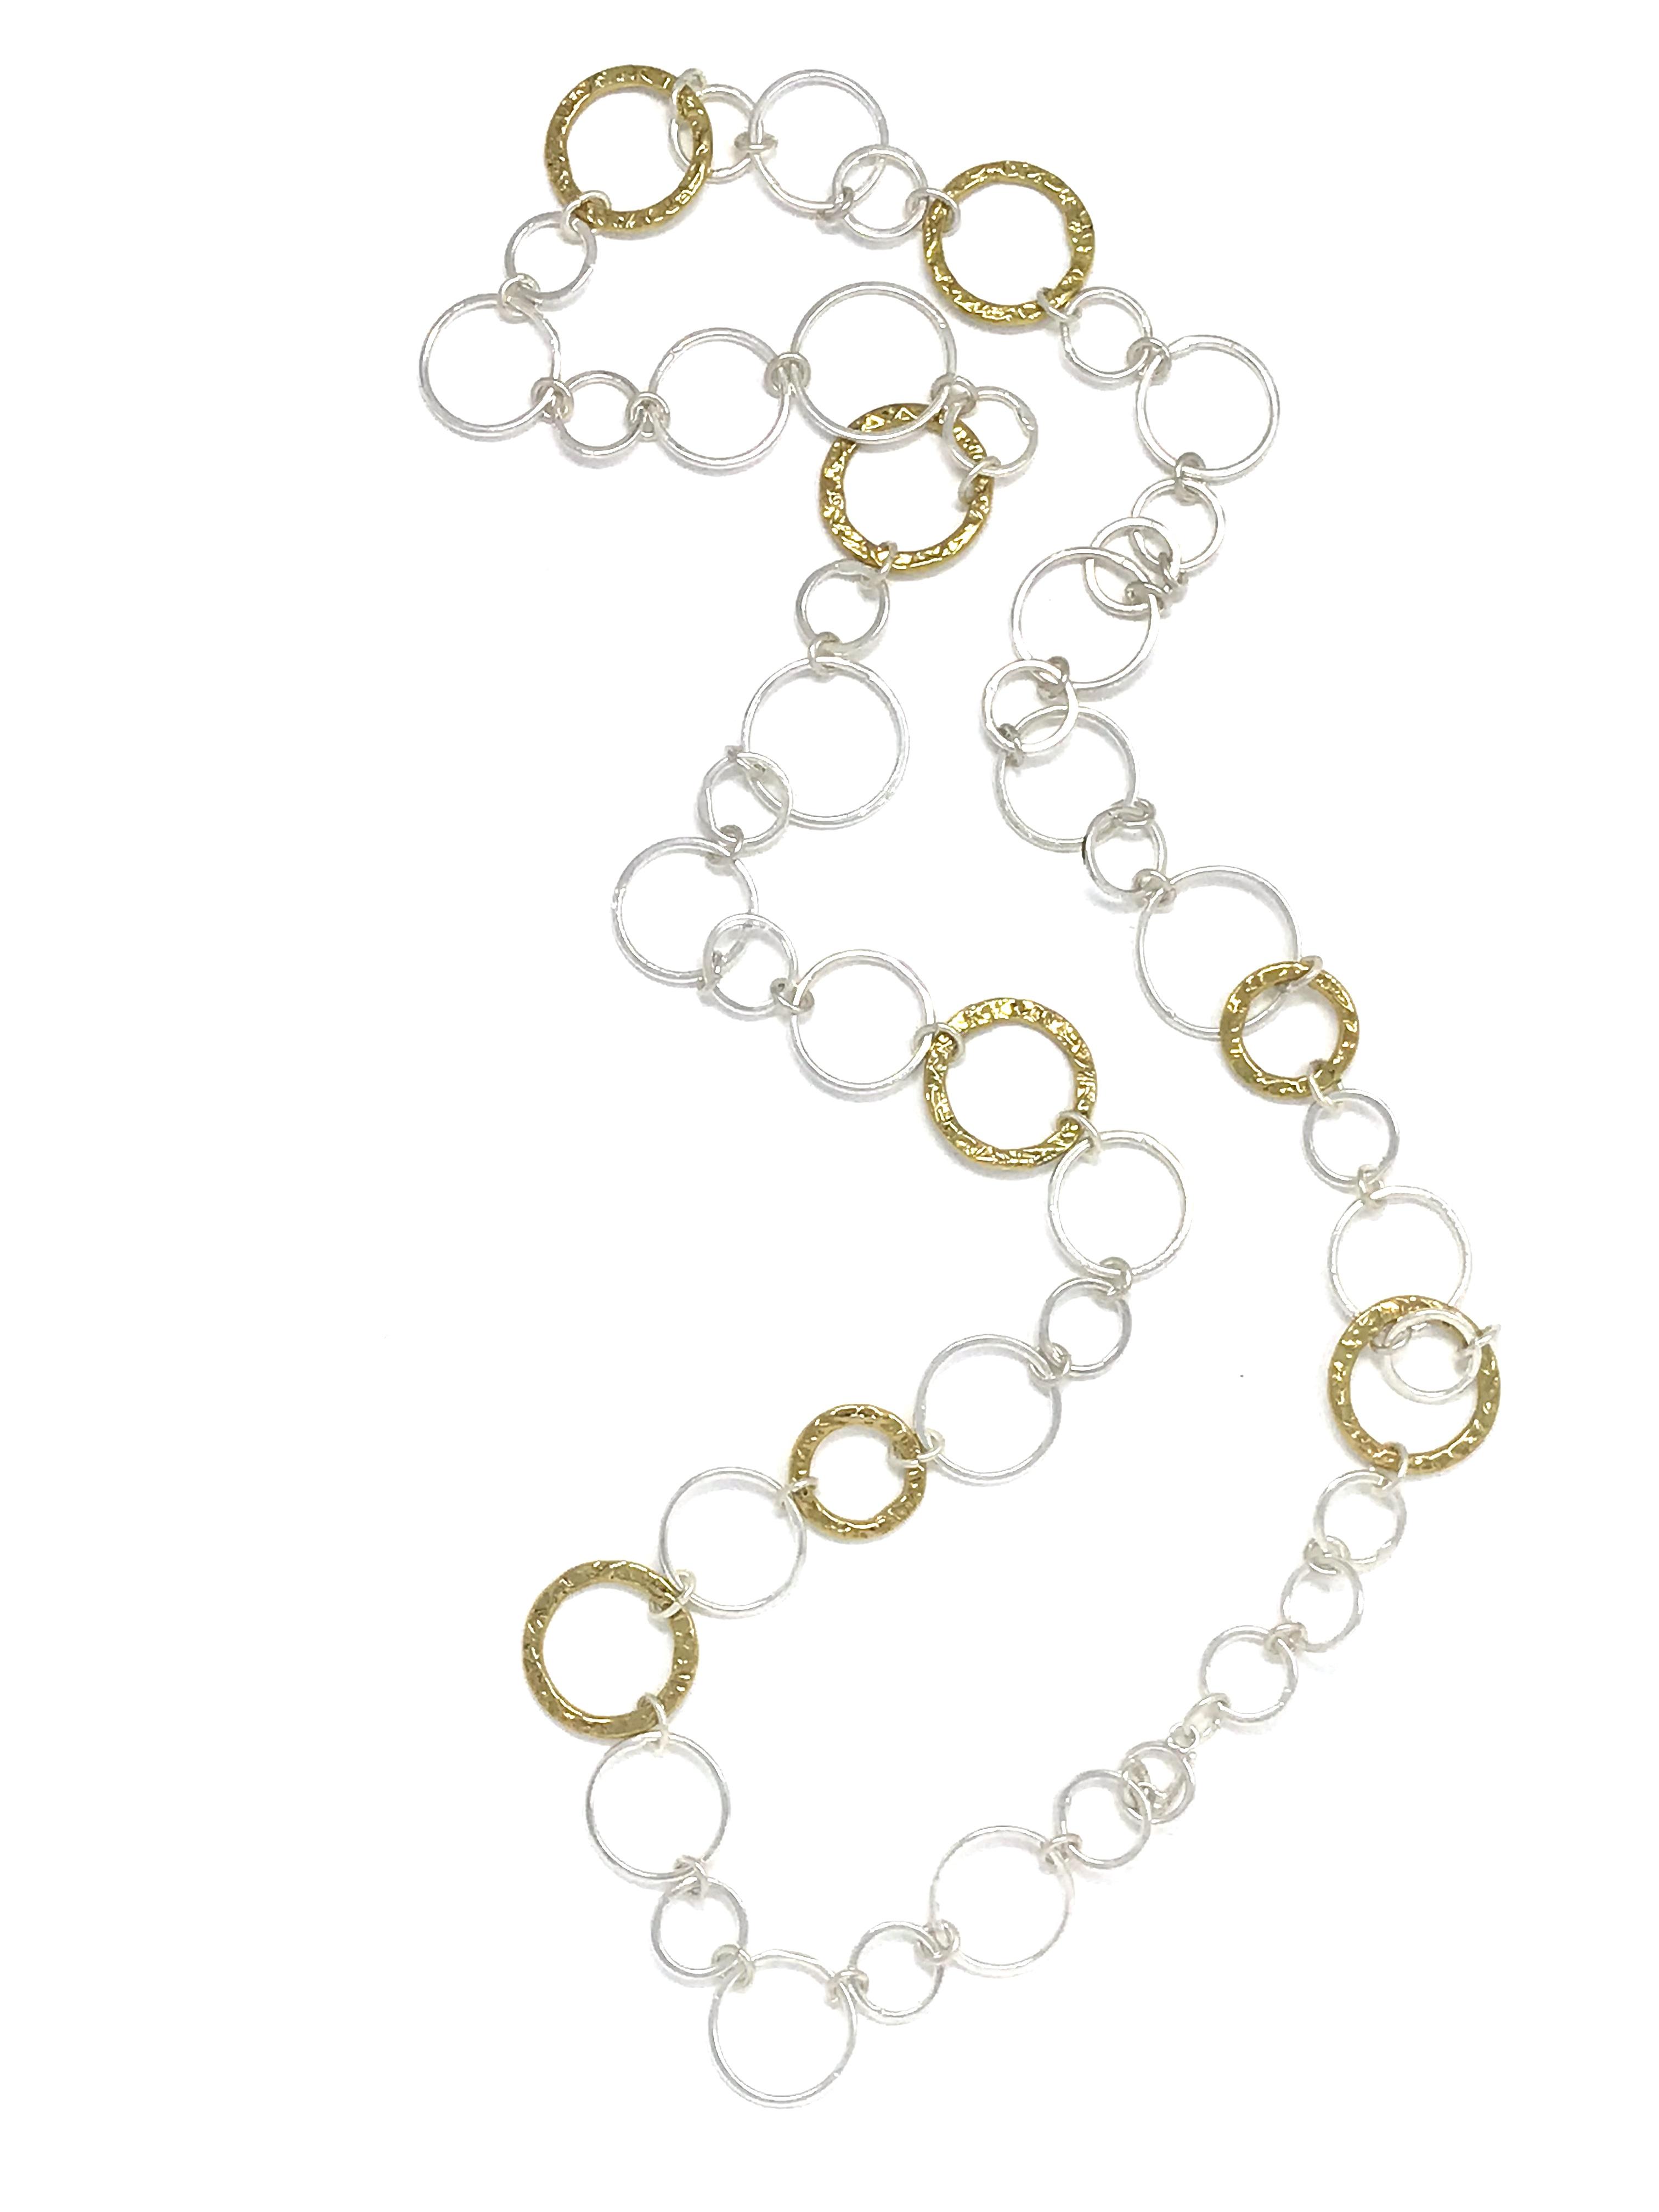 Impromptu mixed necklace